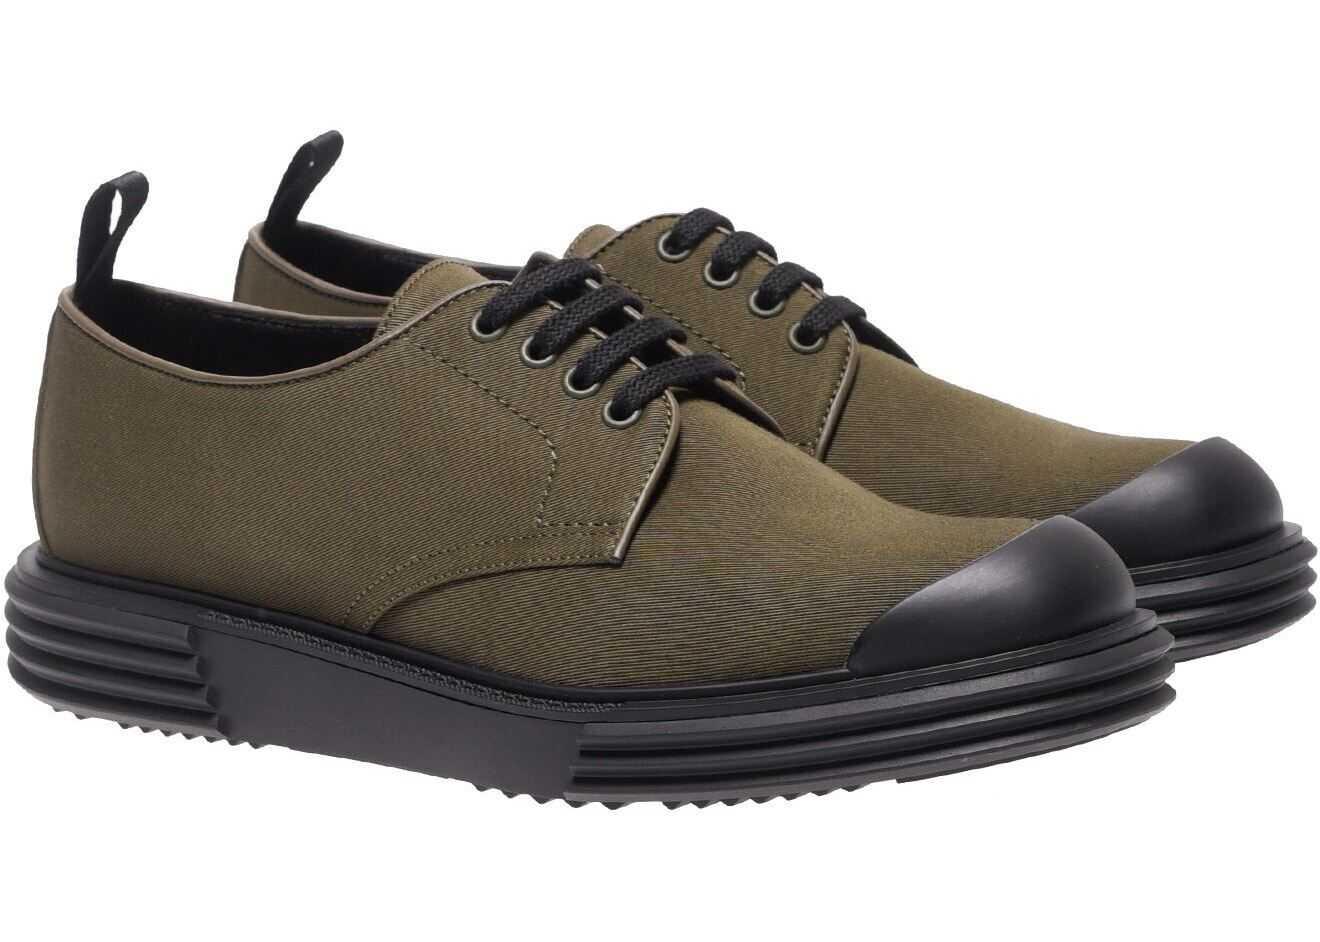 Prada Prada Army Green Fabric Shoes 2EE286 GUD F0161 Green imagine b-mall.ro